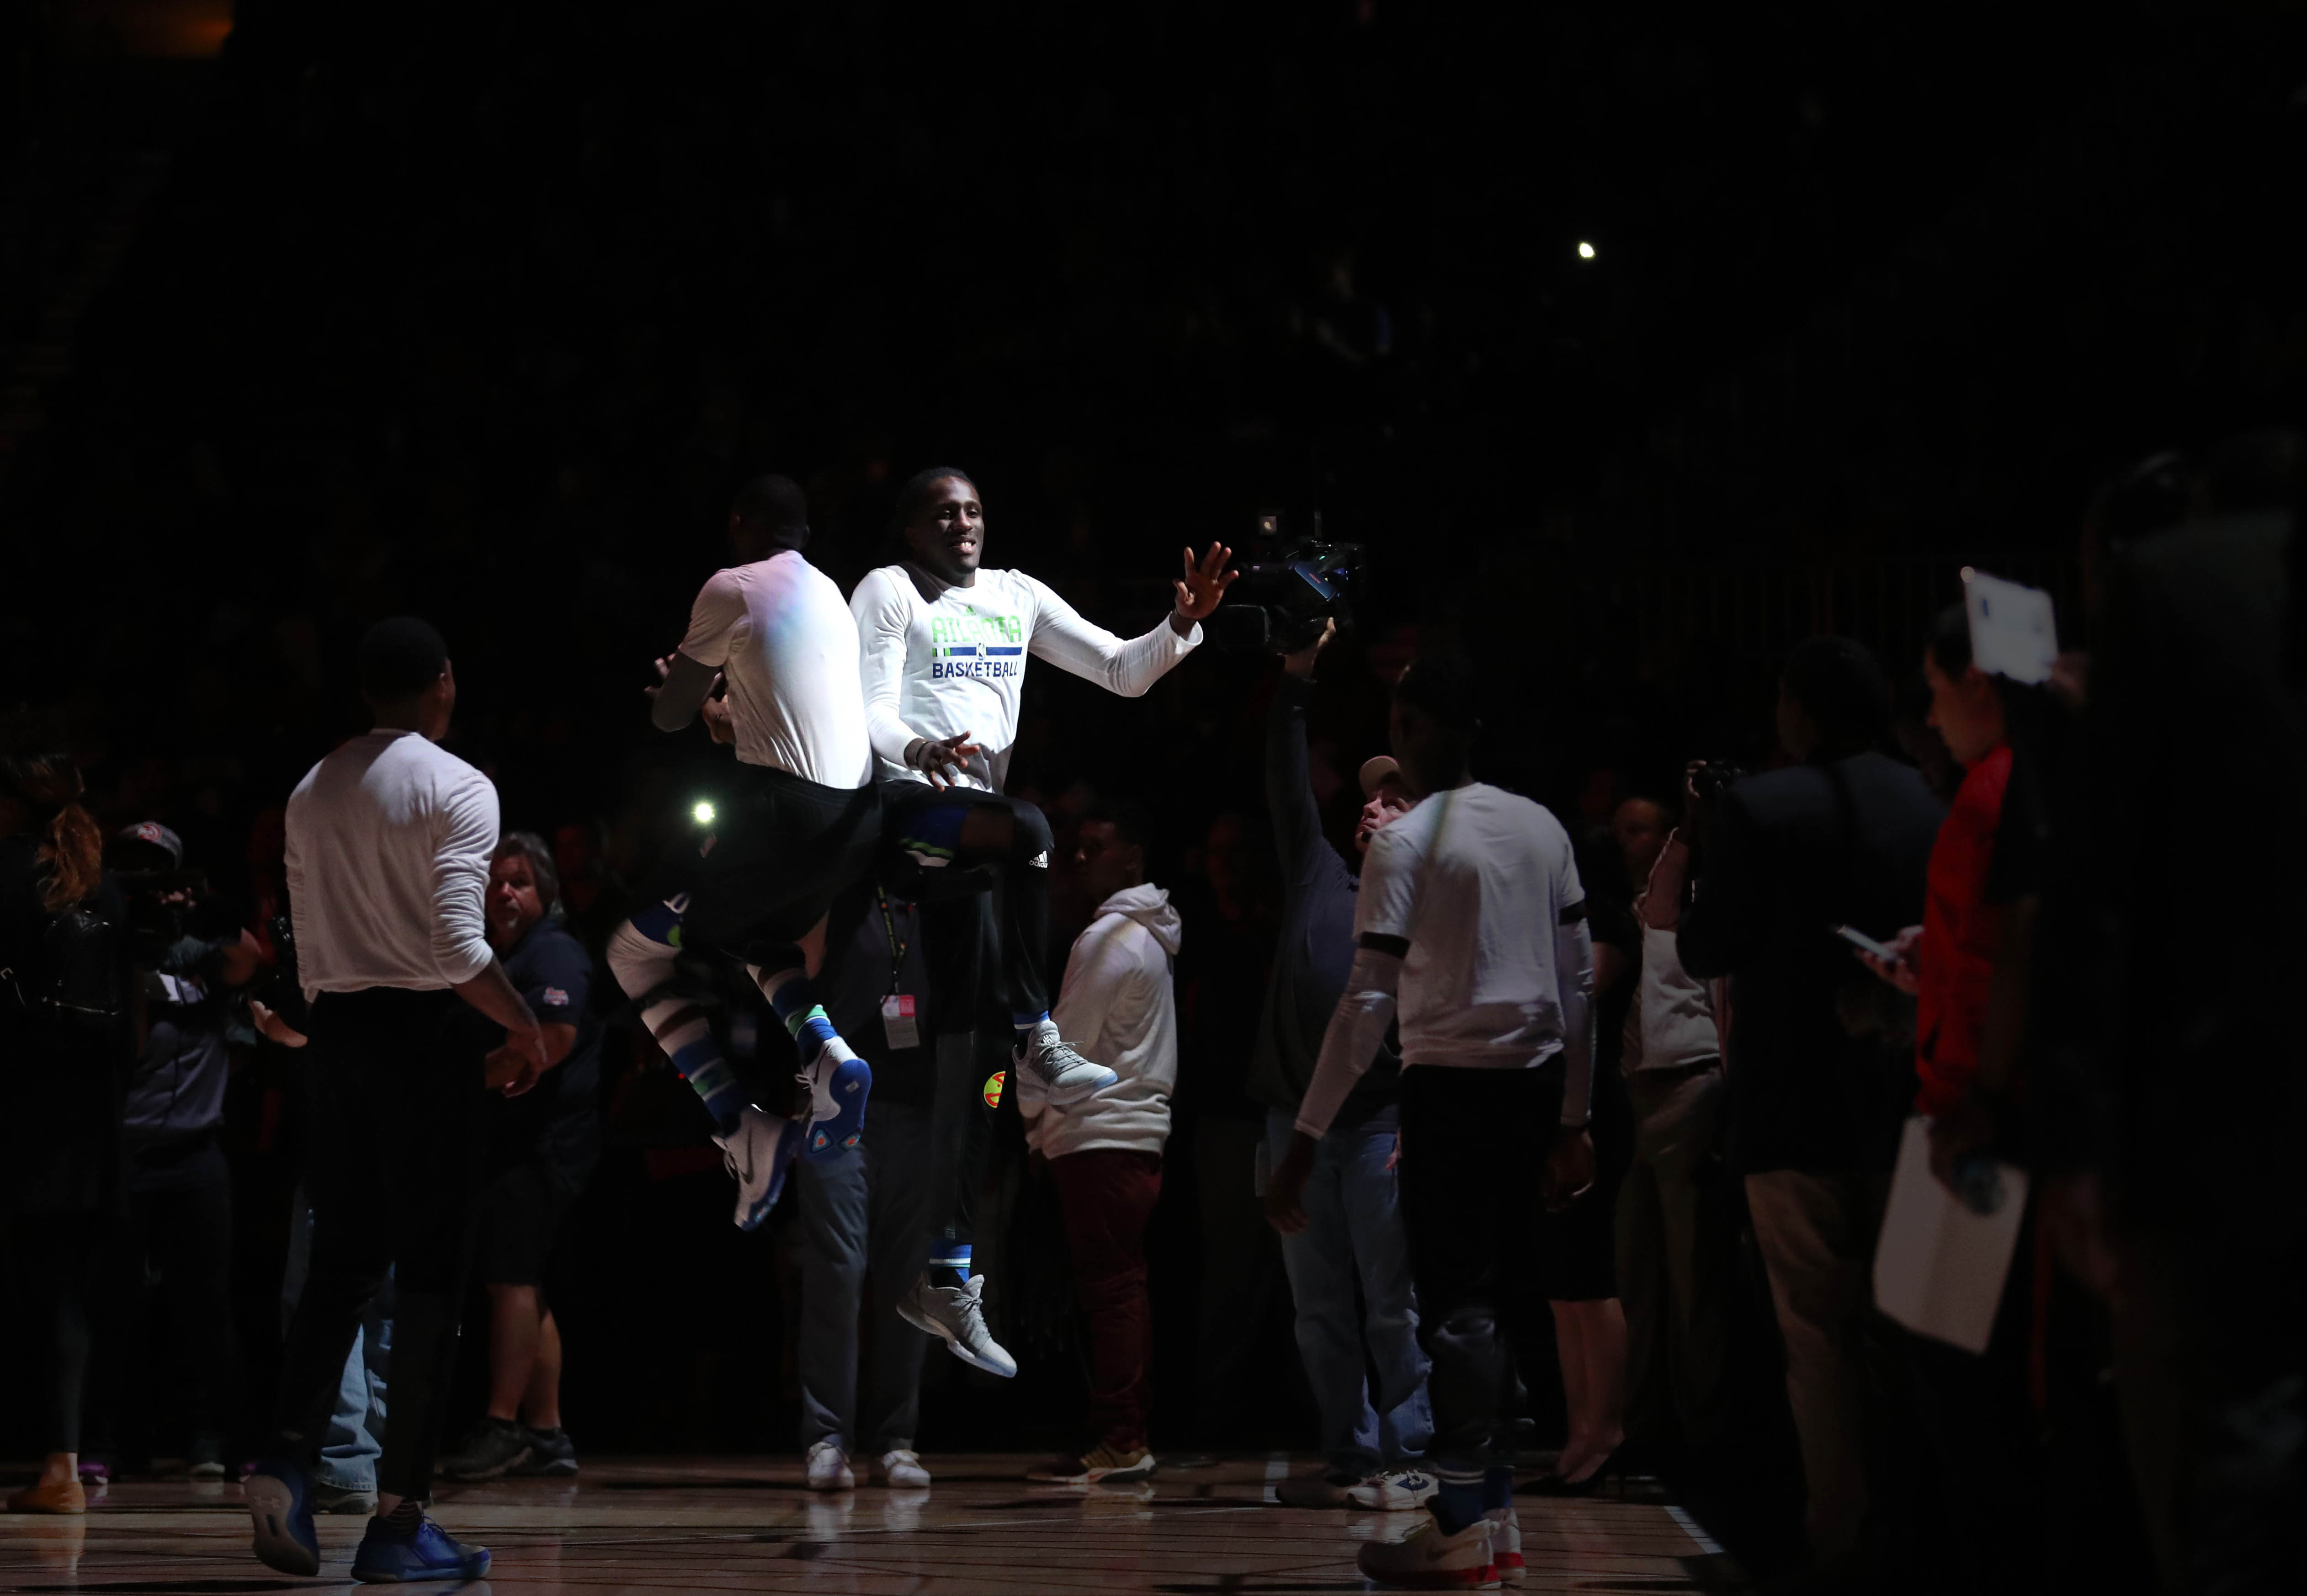 Bulls, Pacers grab last 2 spots in NBA playoffs